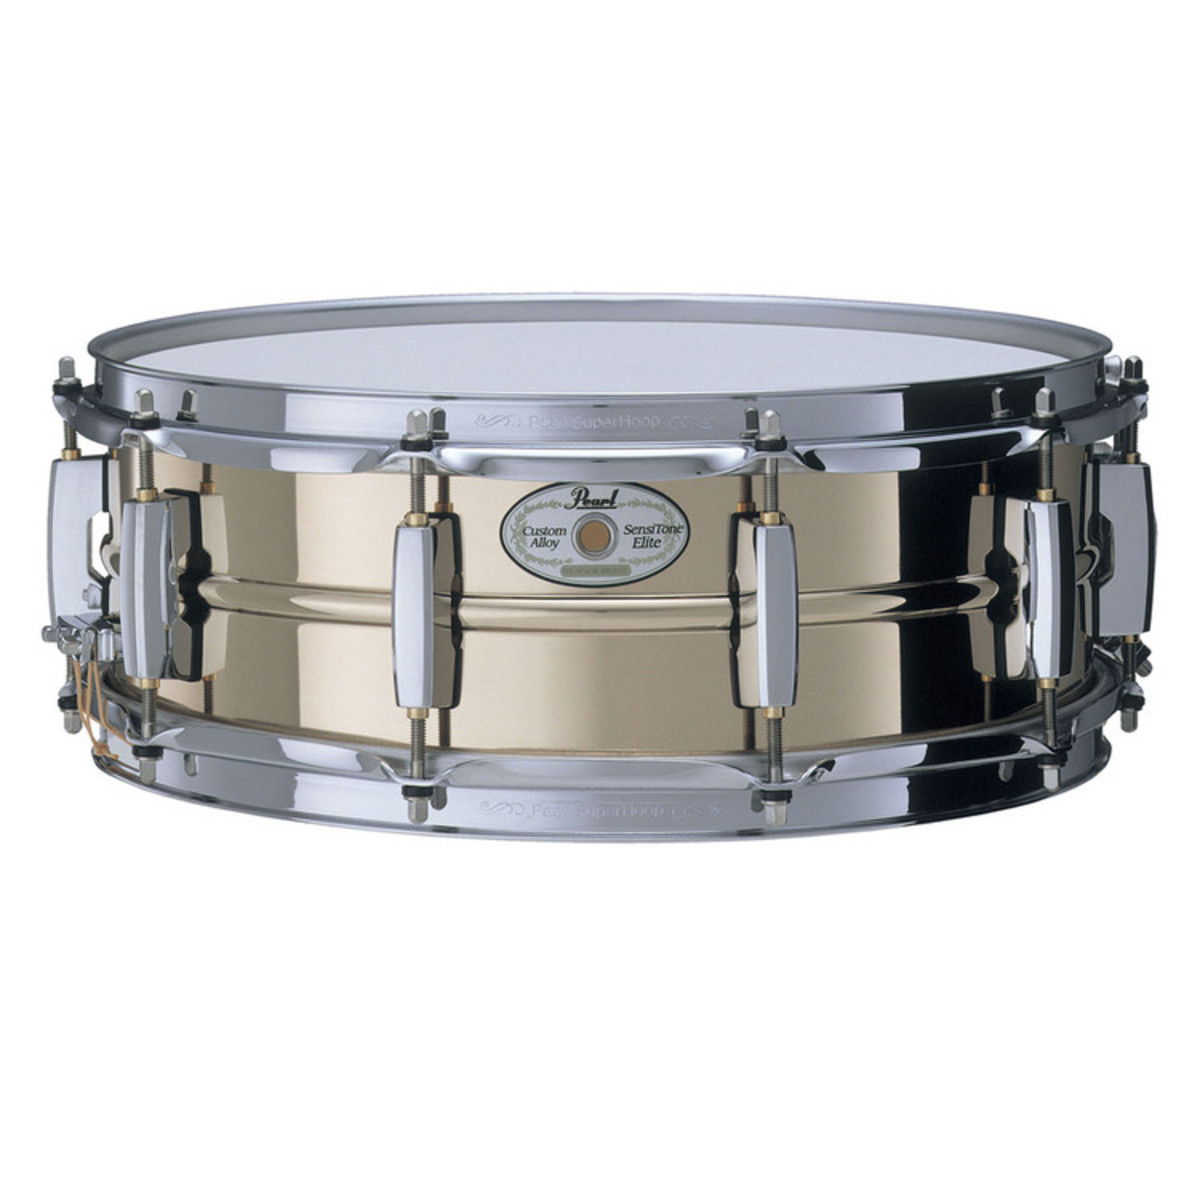 disc pearl sensitone elite 14 39 39 x 5 39 39 snare drum phosphor bronze at. Black Bedroom Furniture Sets. Home Design Ideas